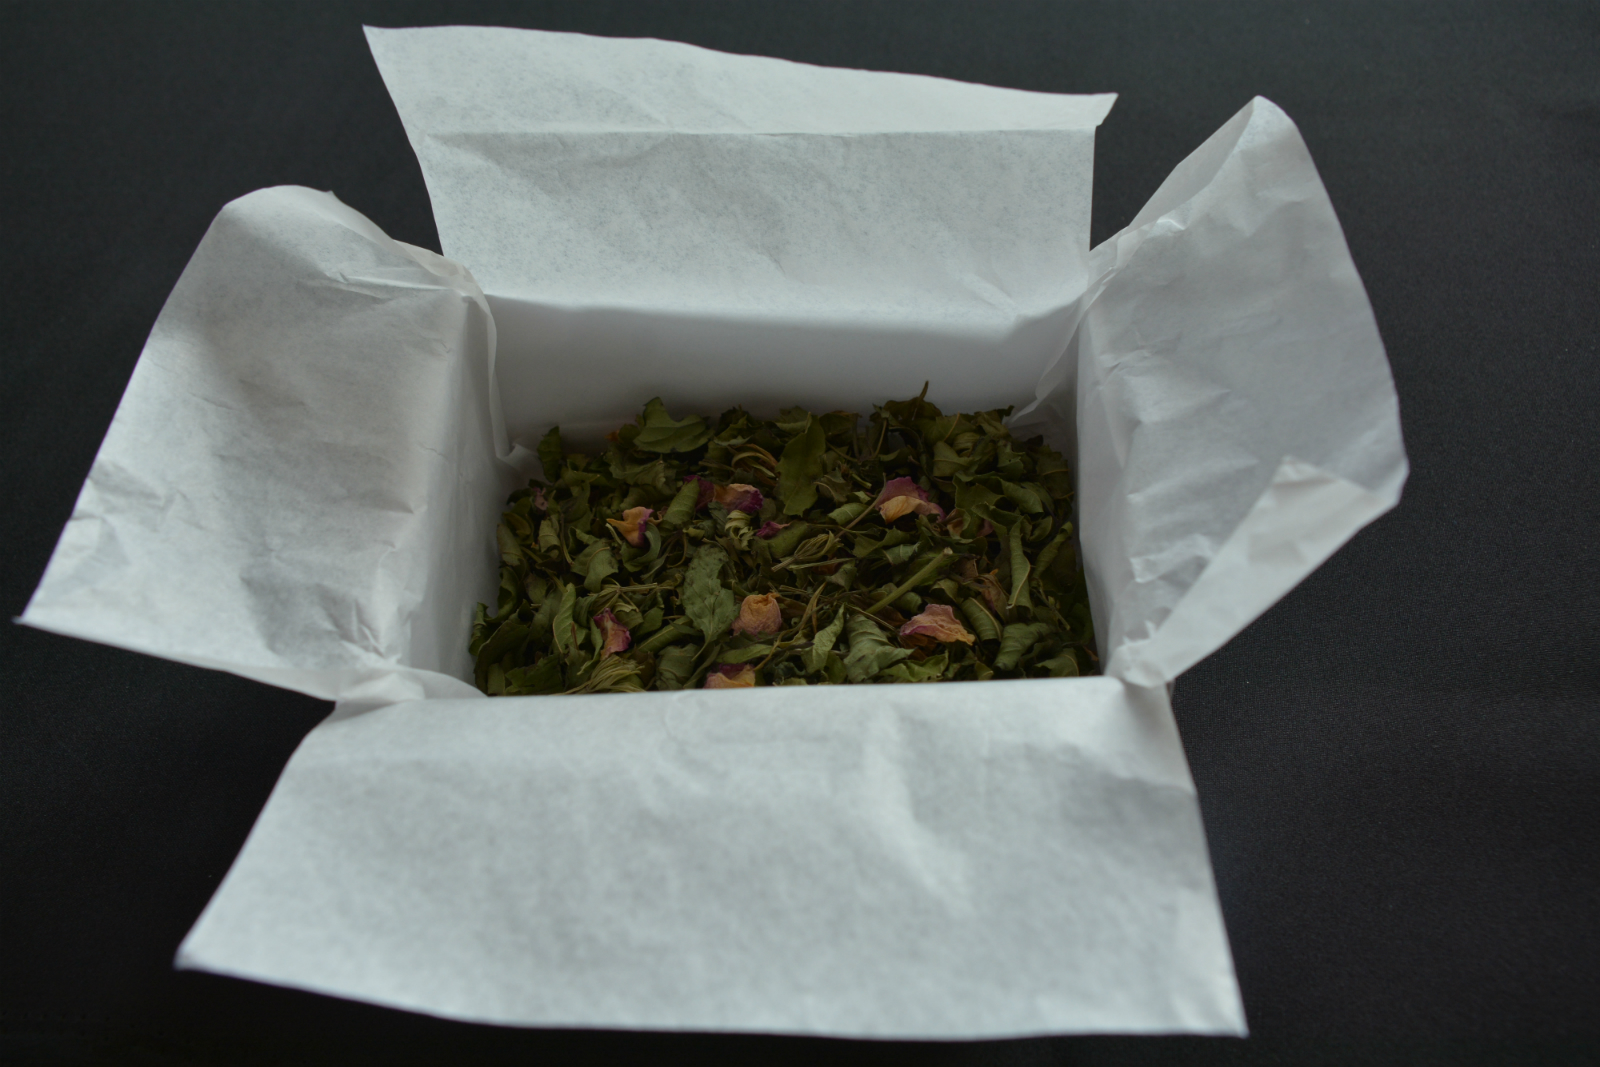 tisane-herbs_1600px.jpg